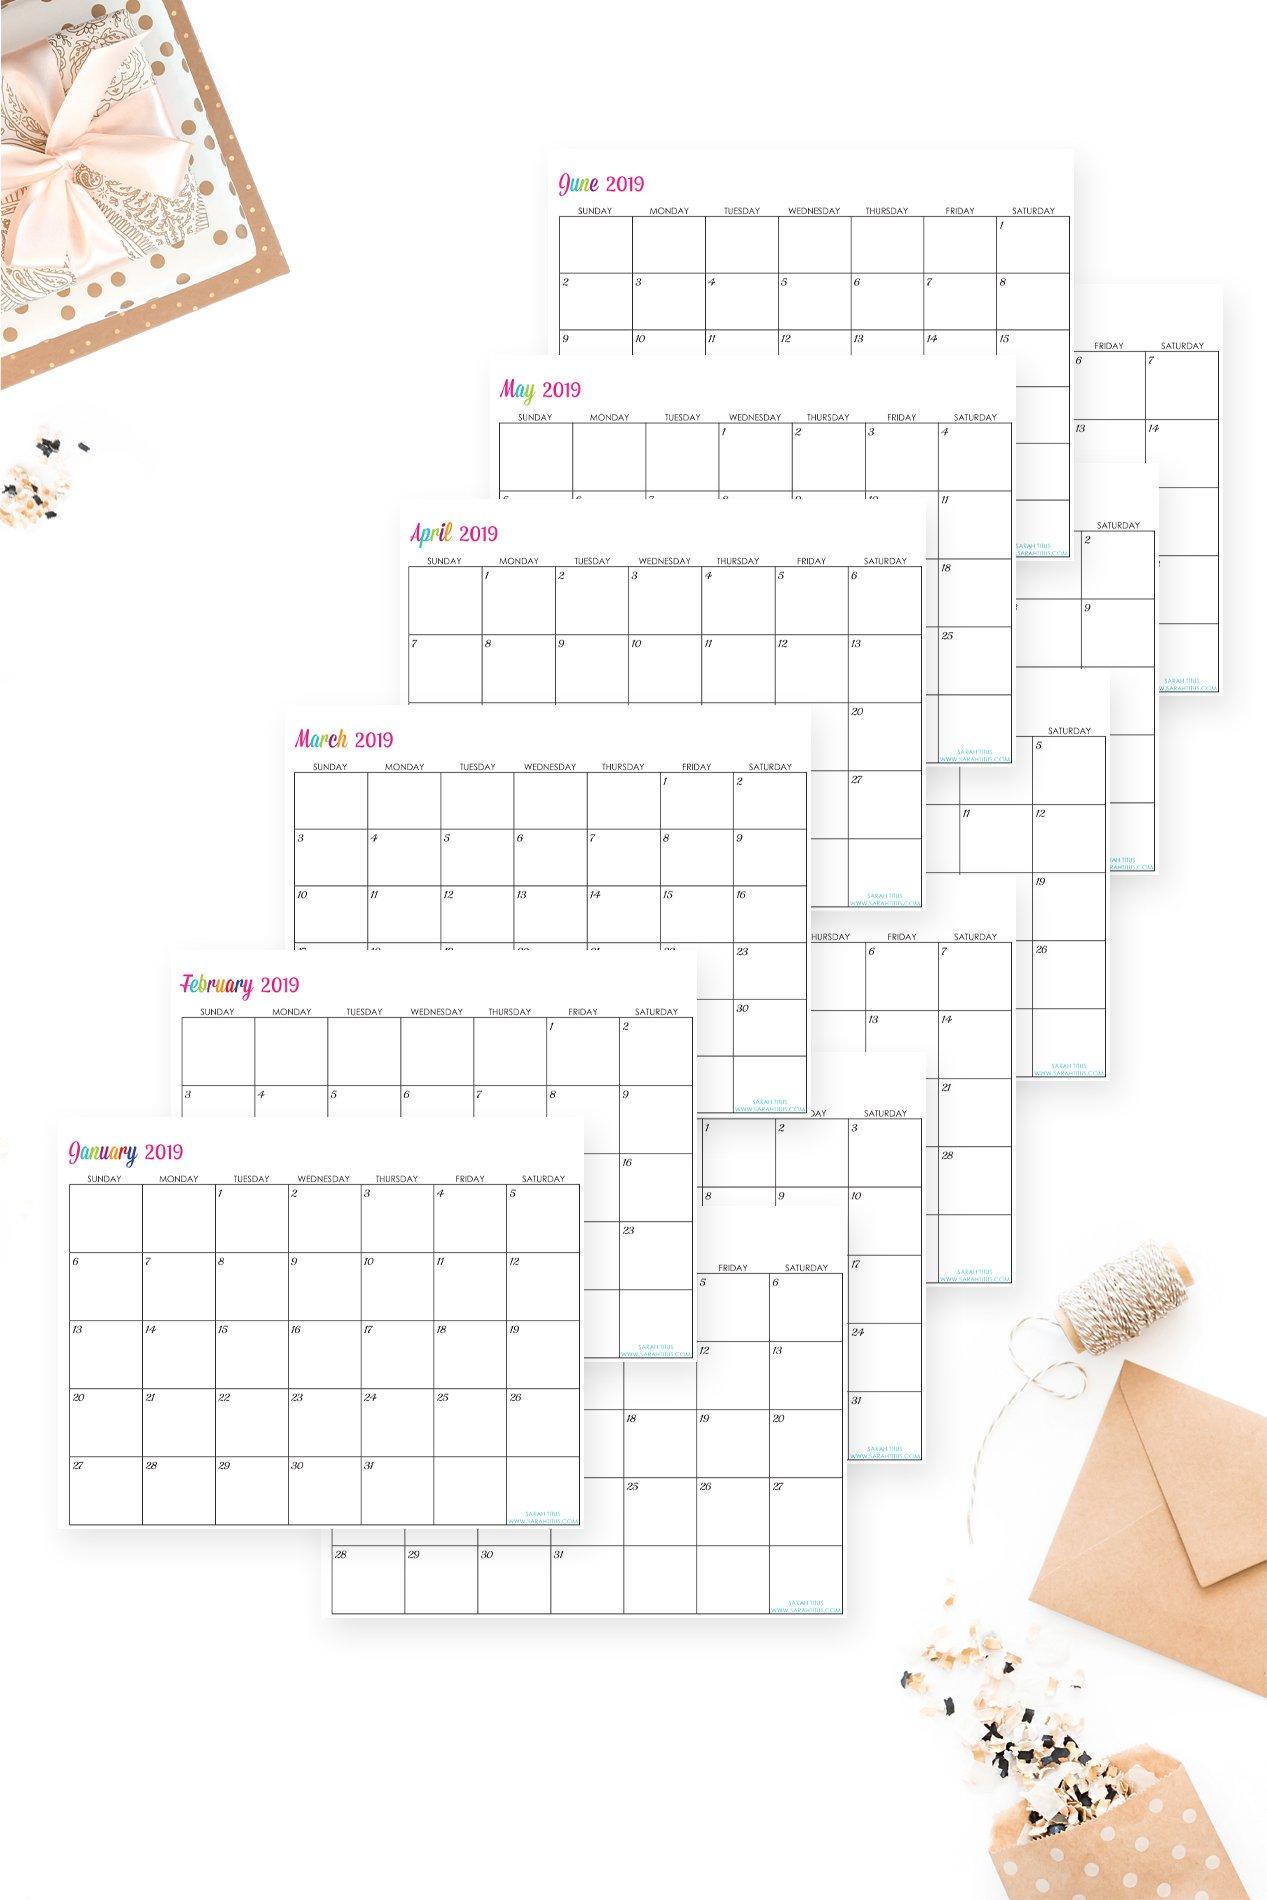 Custom Editable Free Printable 2019 Calendars - Sarah Titus Free Calendars That I Can Edit And Print